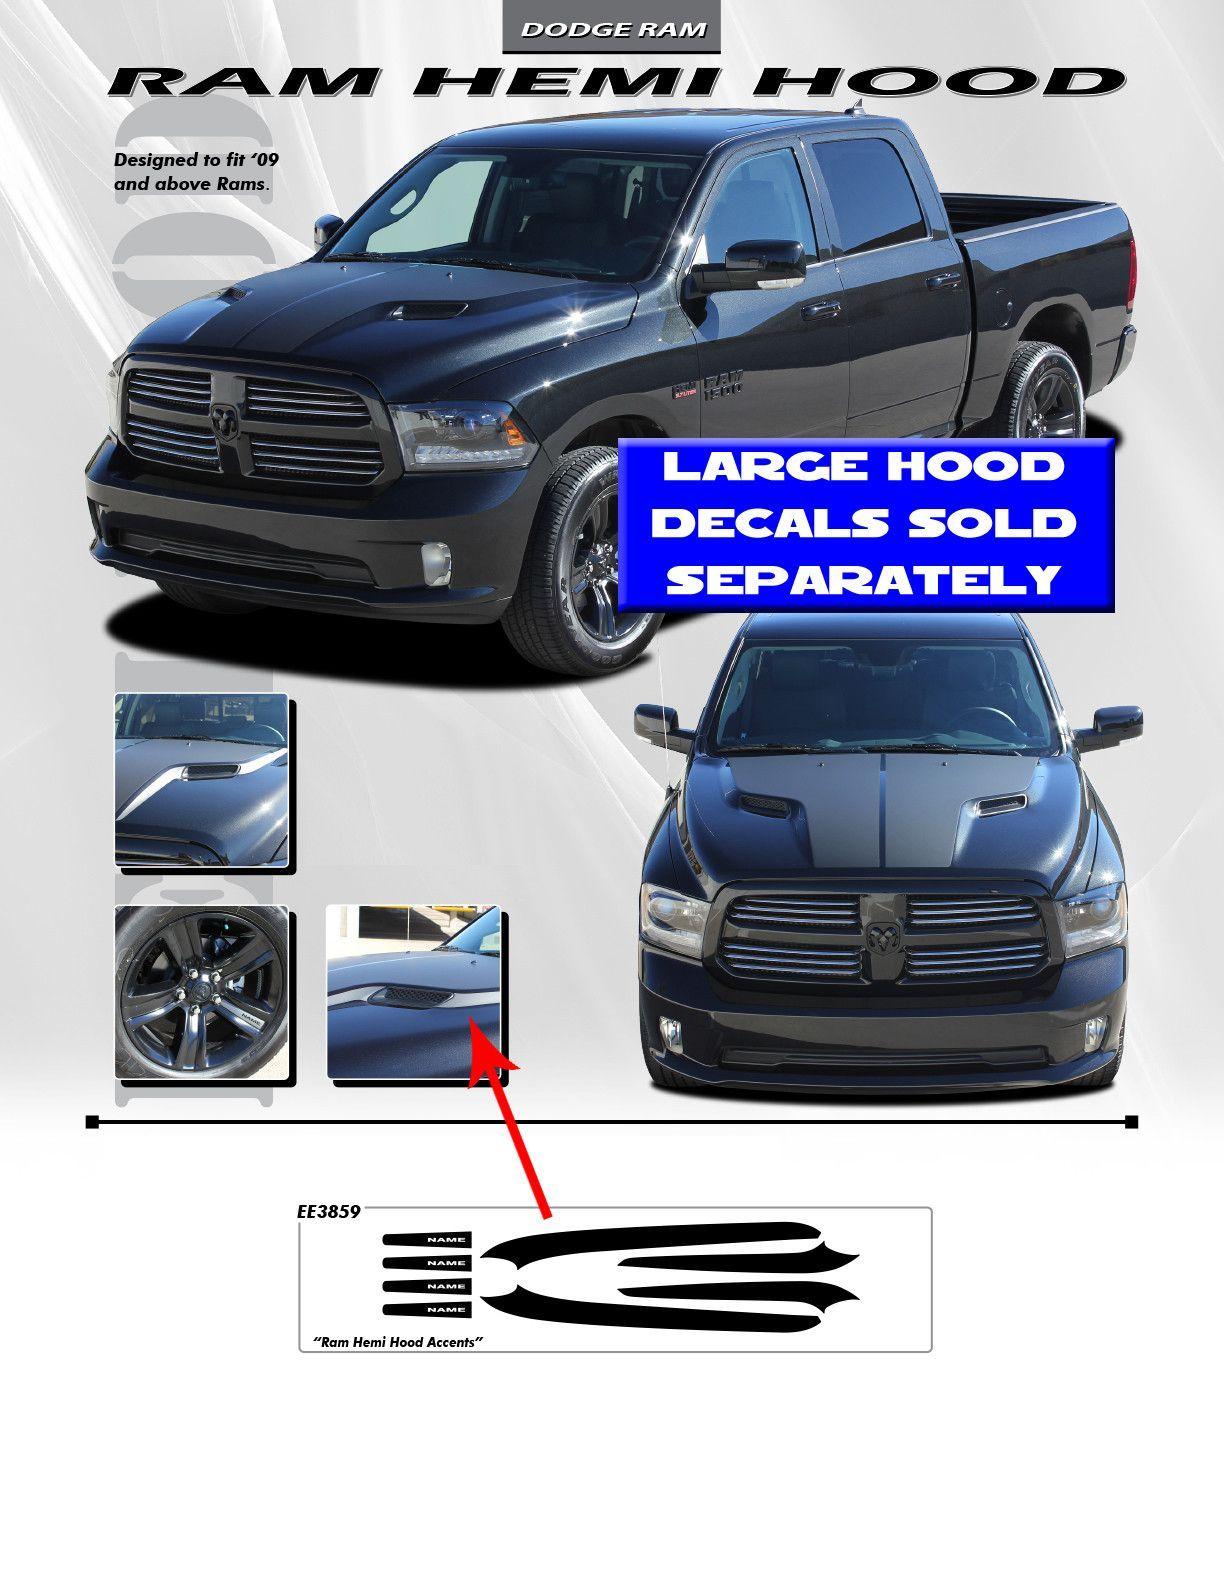 2009 Up Dodge Ram Hemi Hood Spears Wheel Stickers 3m Vinyl Graphics Kit Chevy Silverado Car Vinyl Graphics Vinyl Graphics